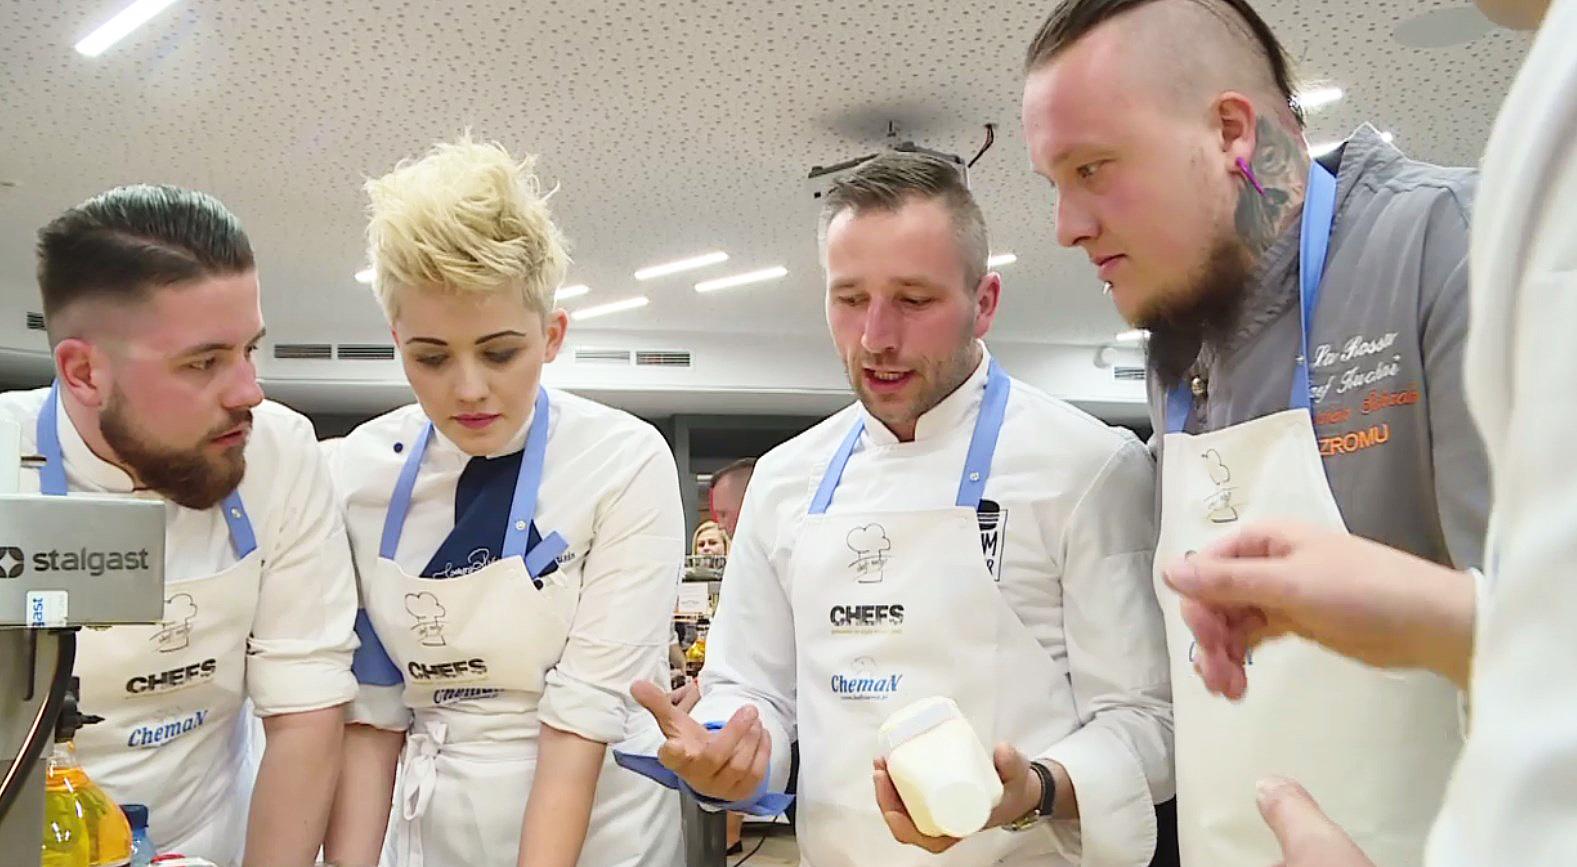 cook news odc. 145